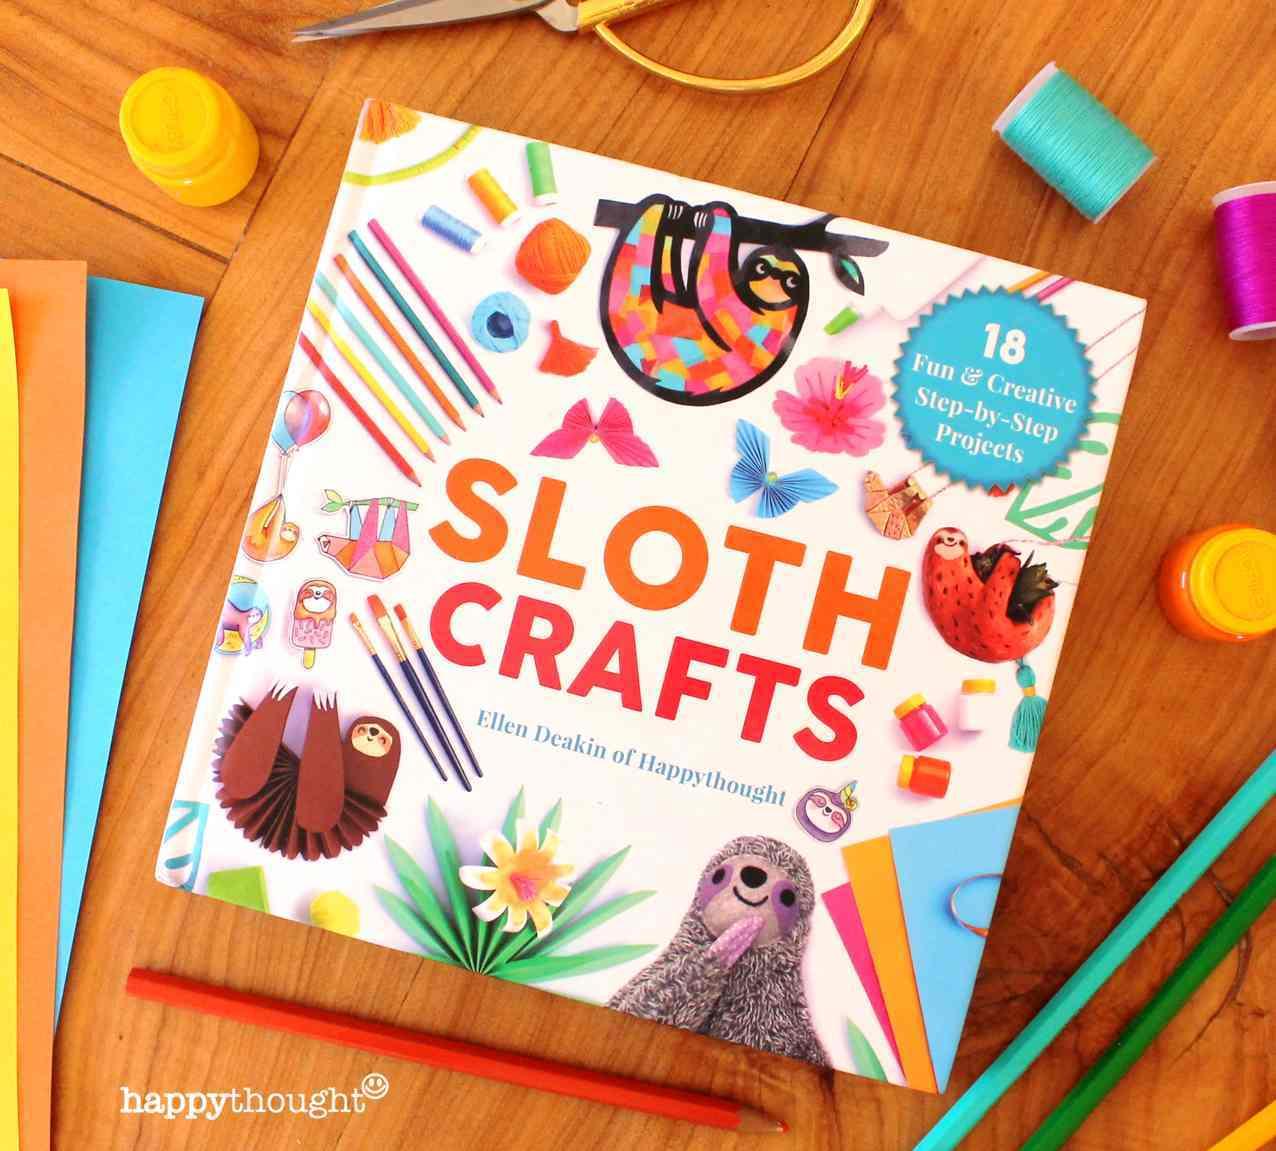 Sloth Crafts by Ellen Deakin of Happythought